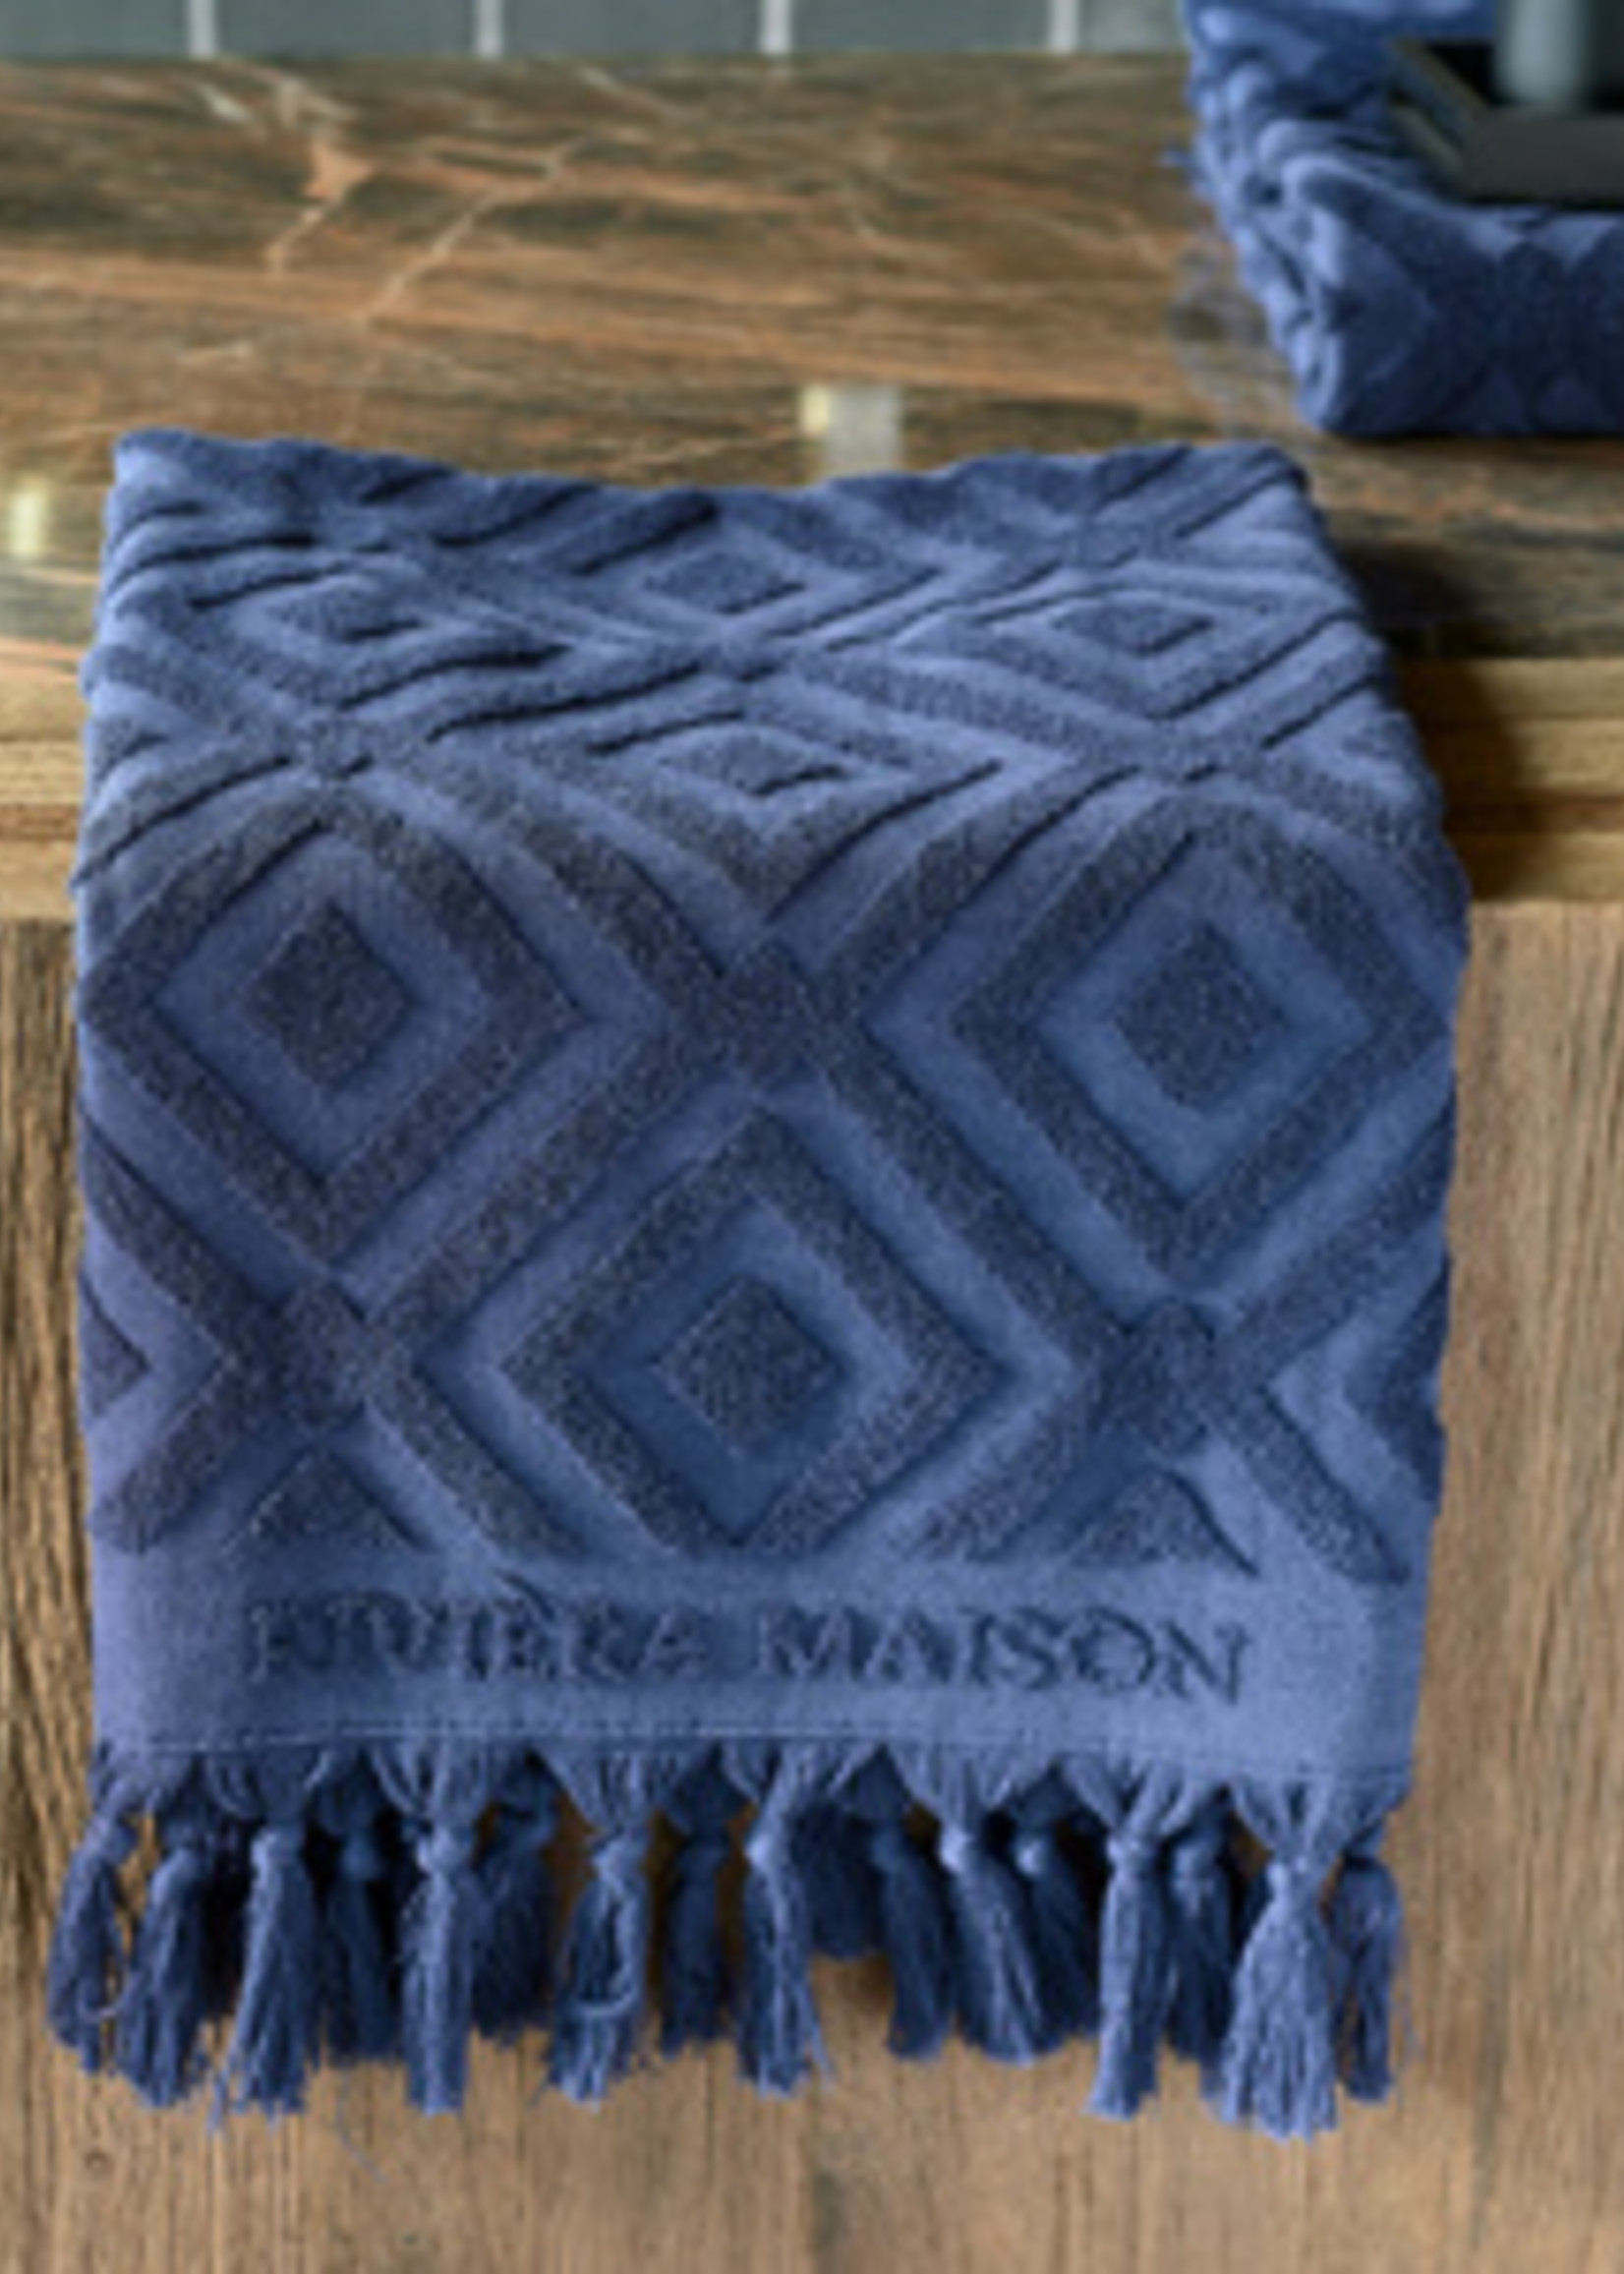 Riviera Maison RM Chic Towel dark blue 100x50